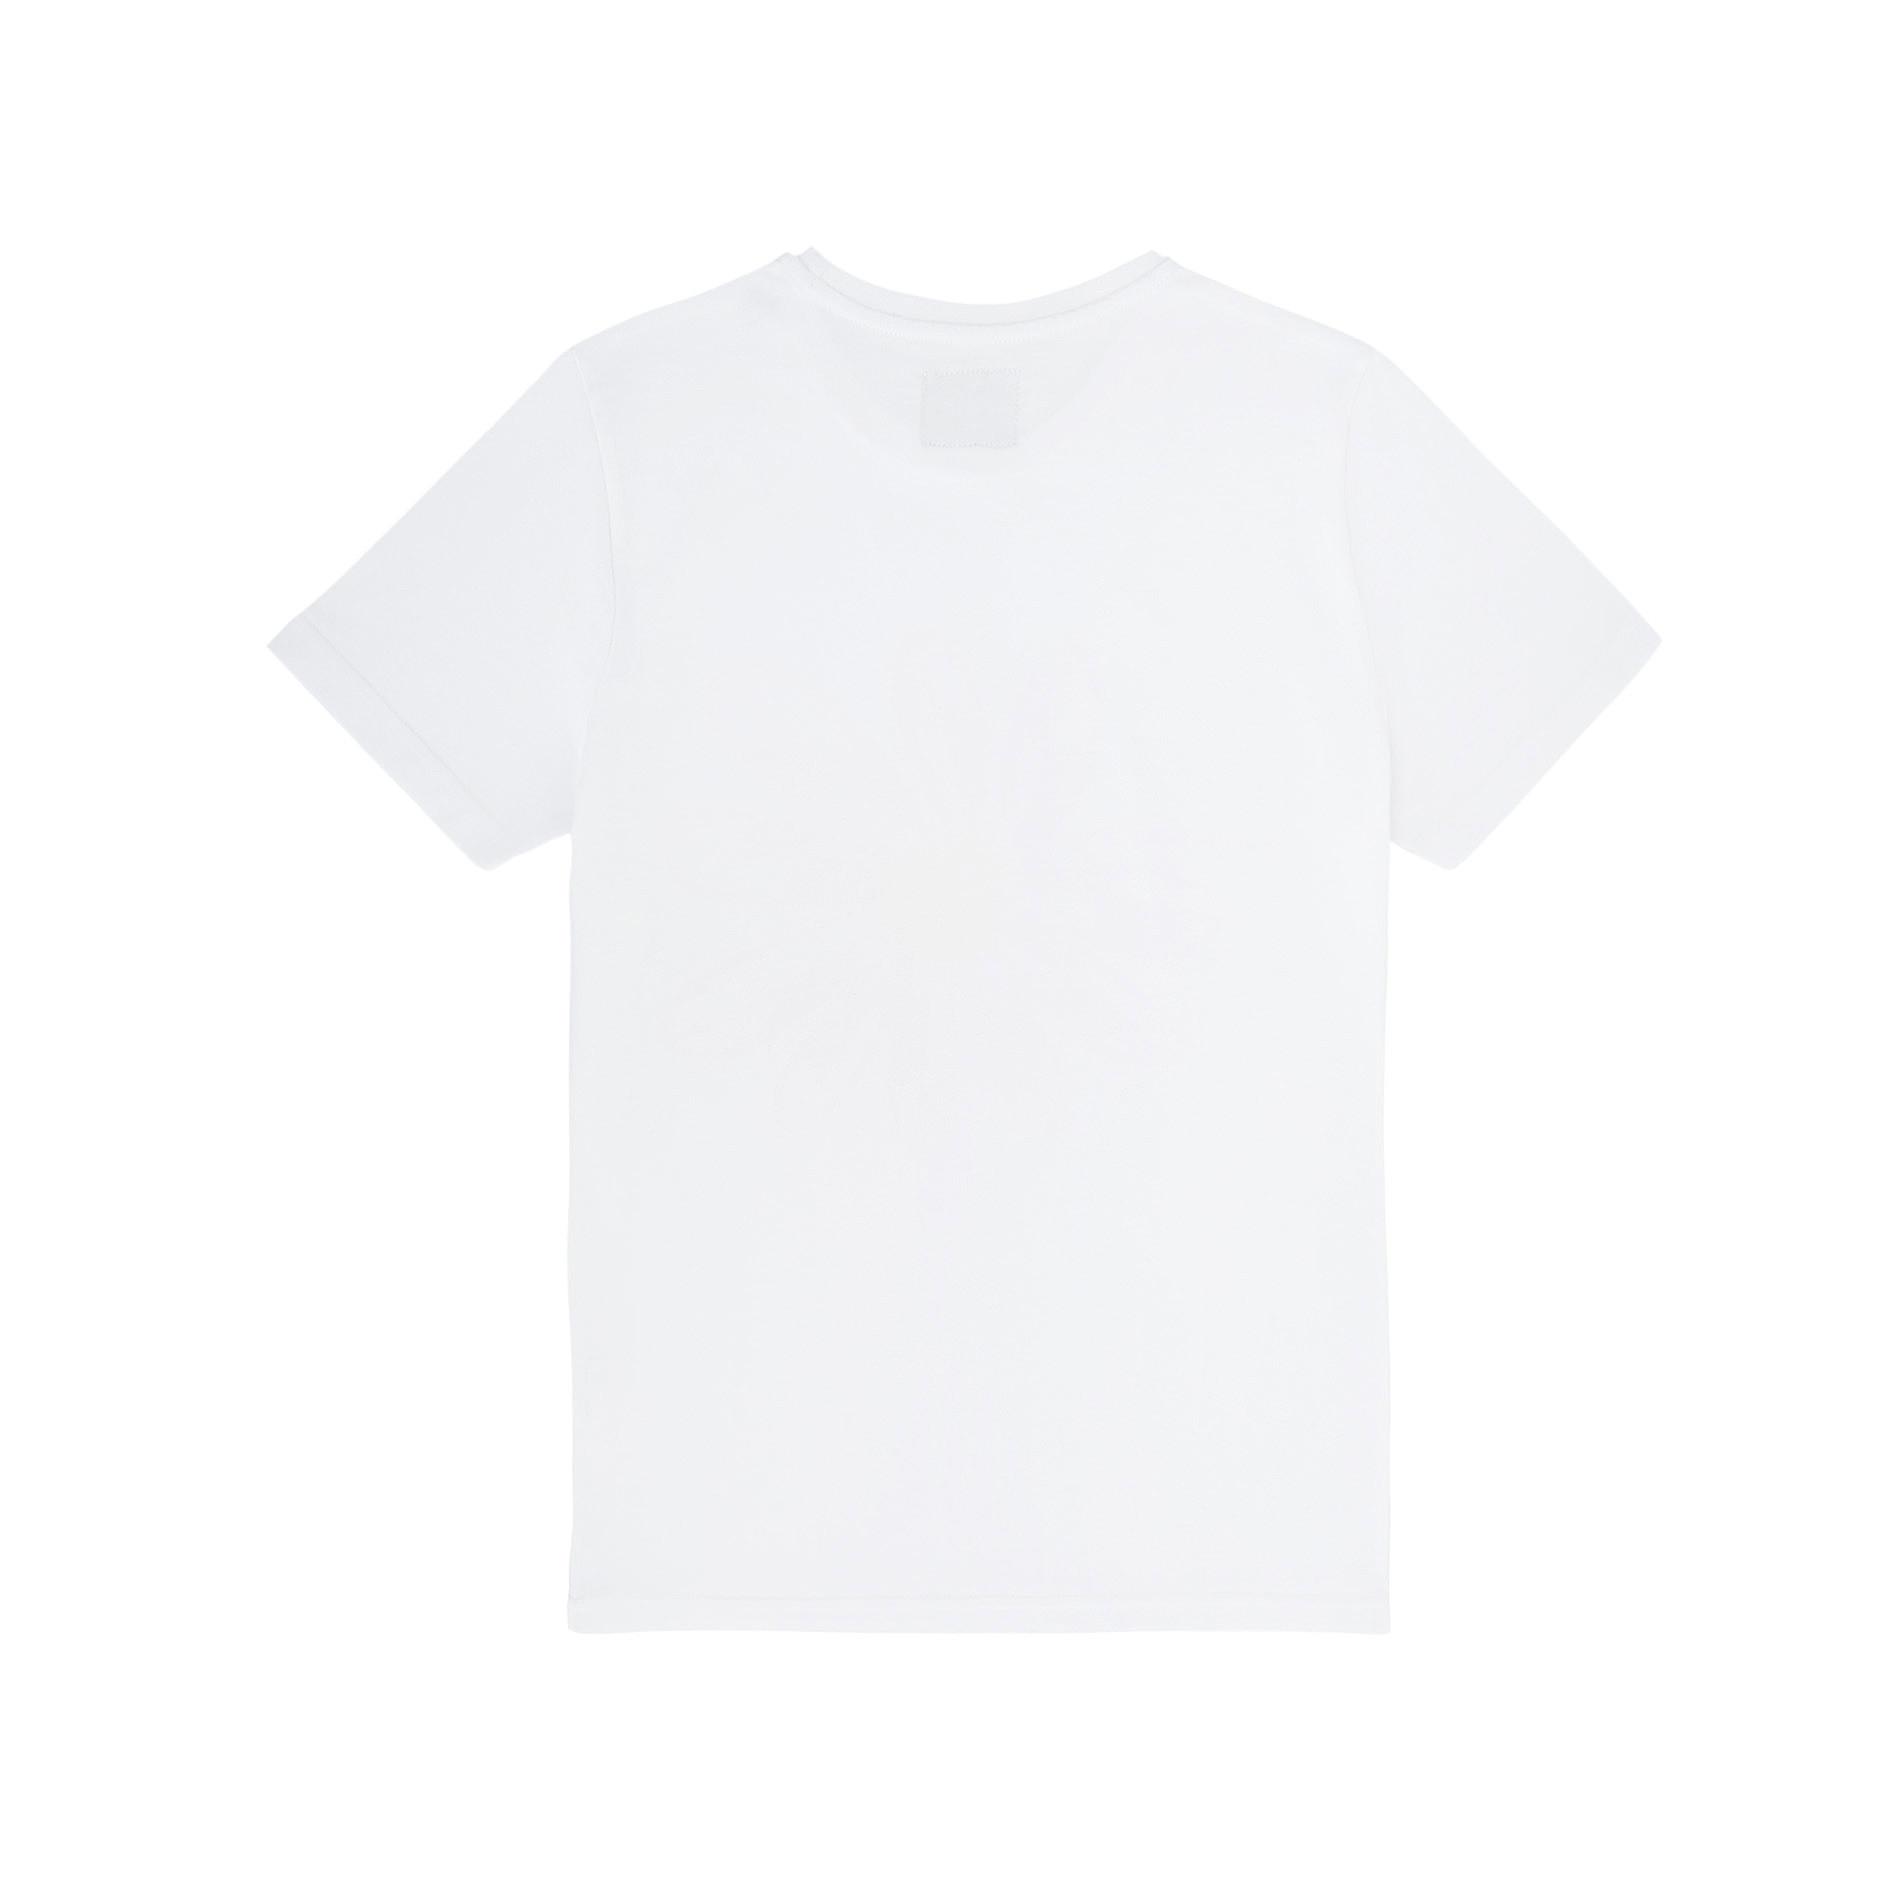 T-shirt puro cotone #mamaononmama, Bianco, large image number 1